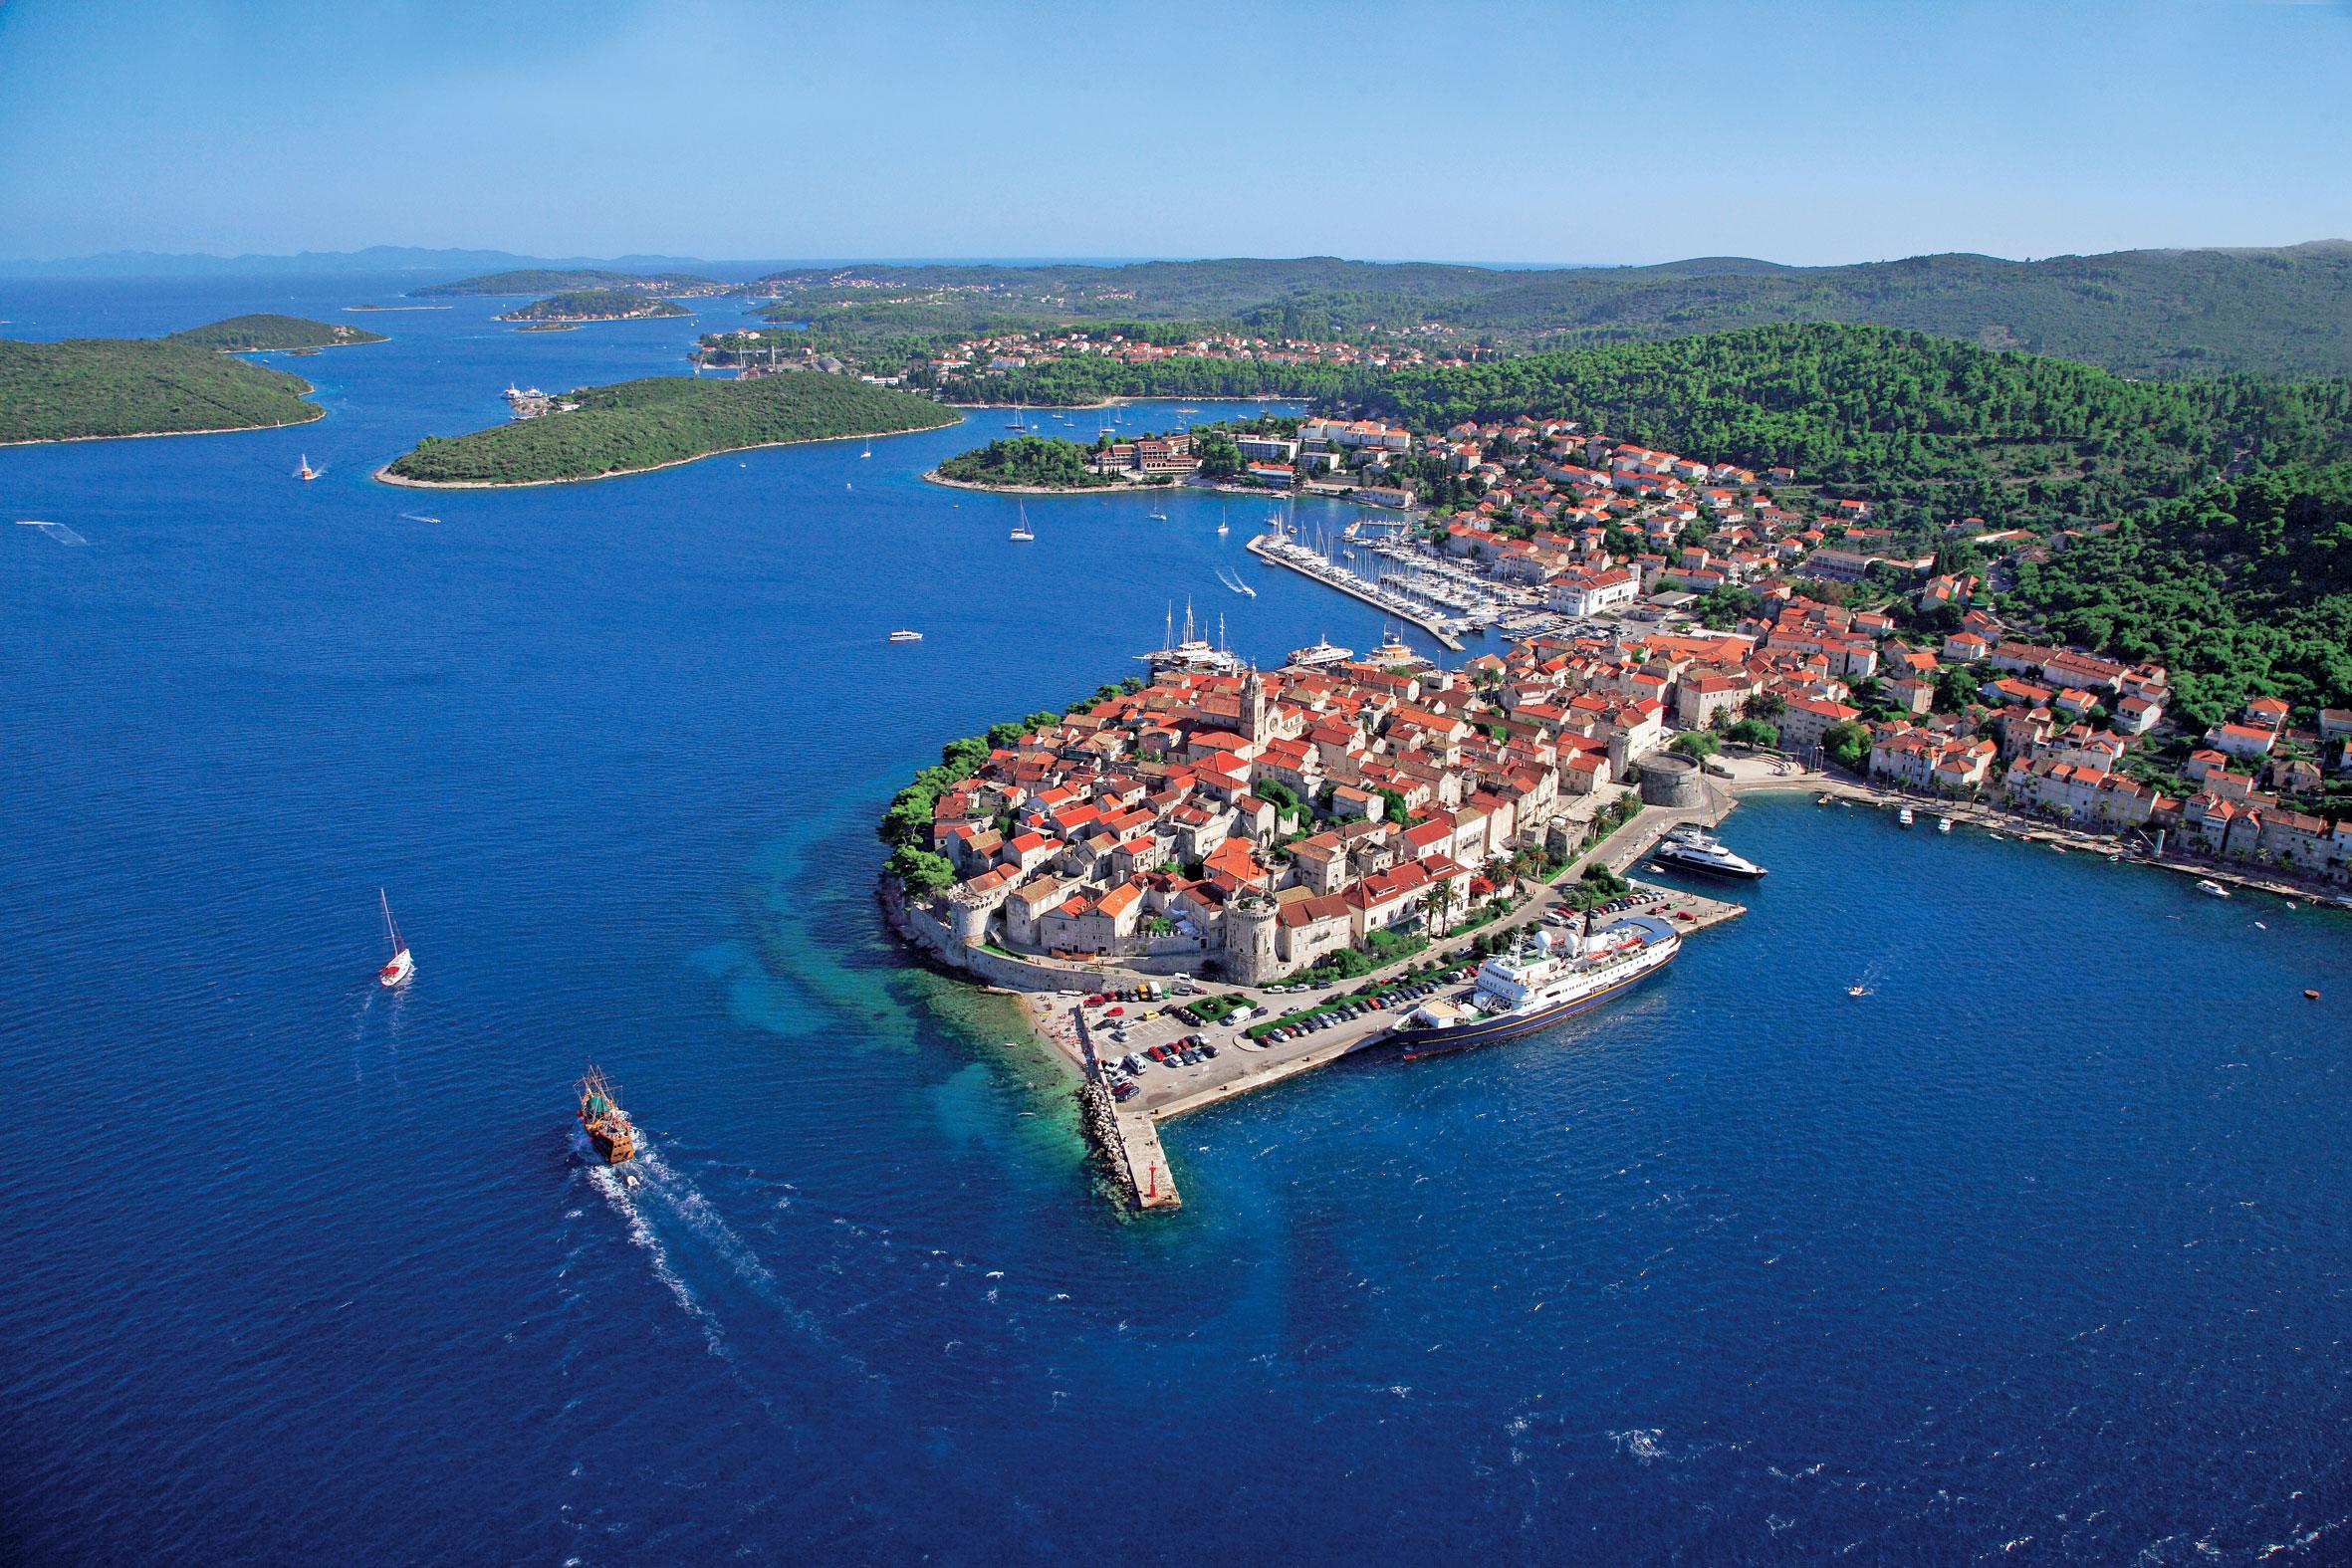 Marco polo festival josipa korcula dragun croatia